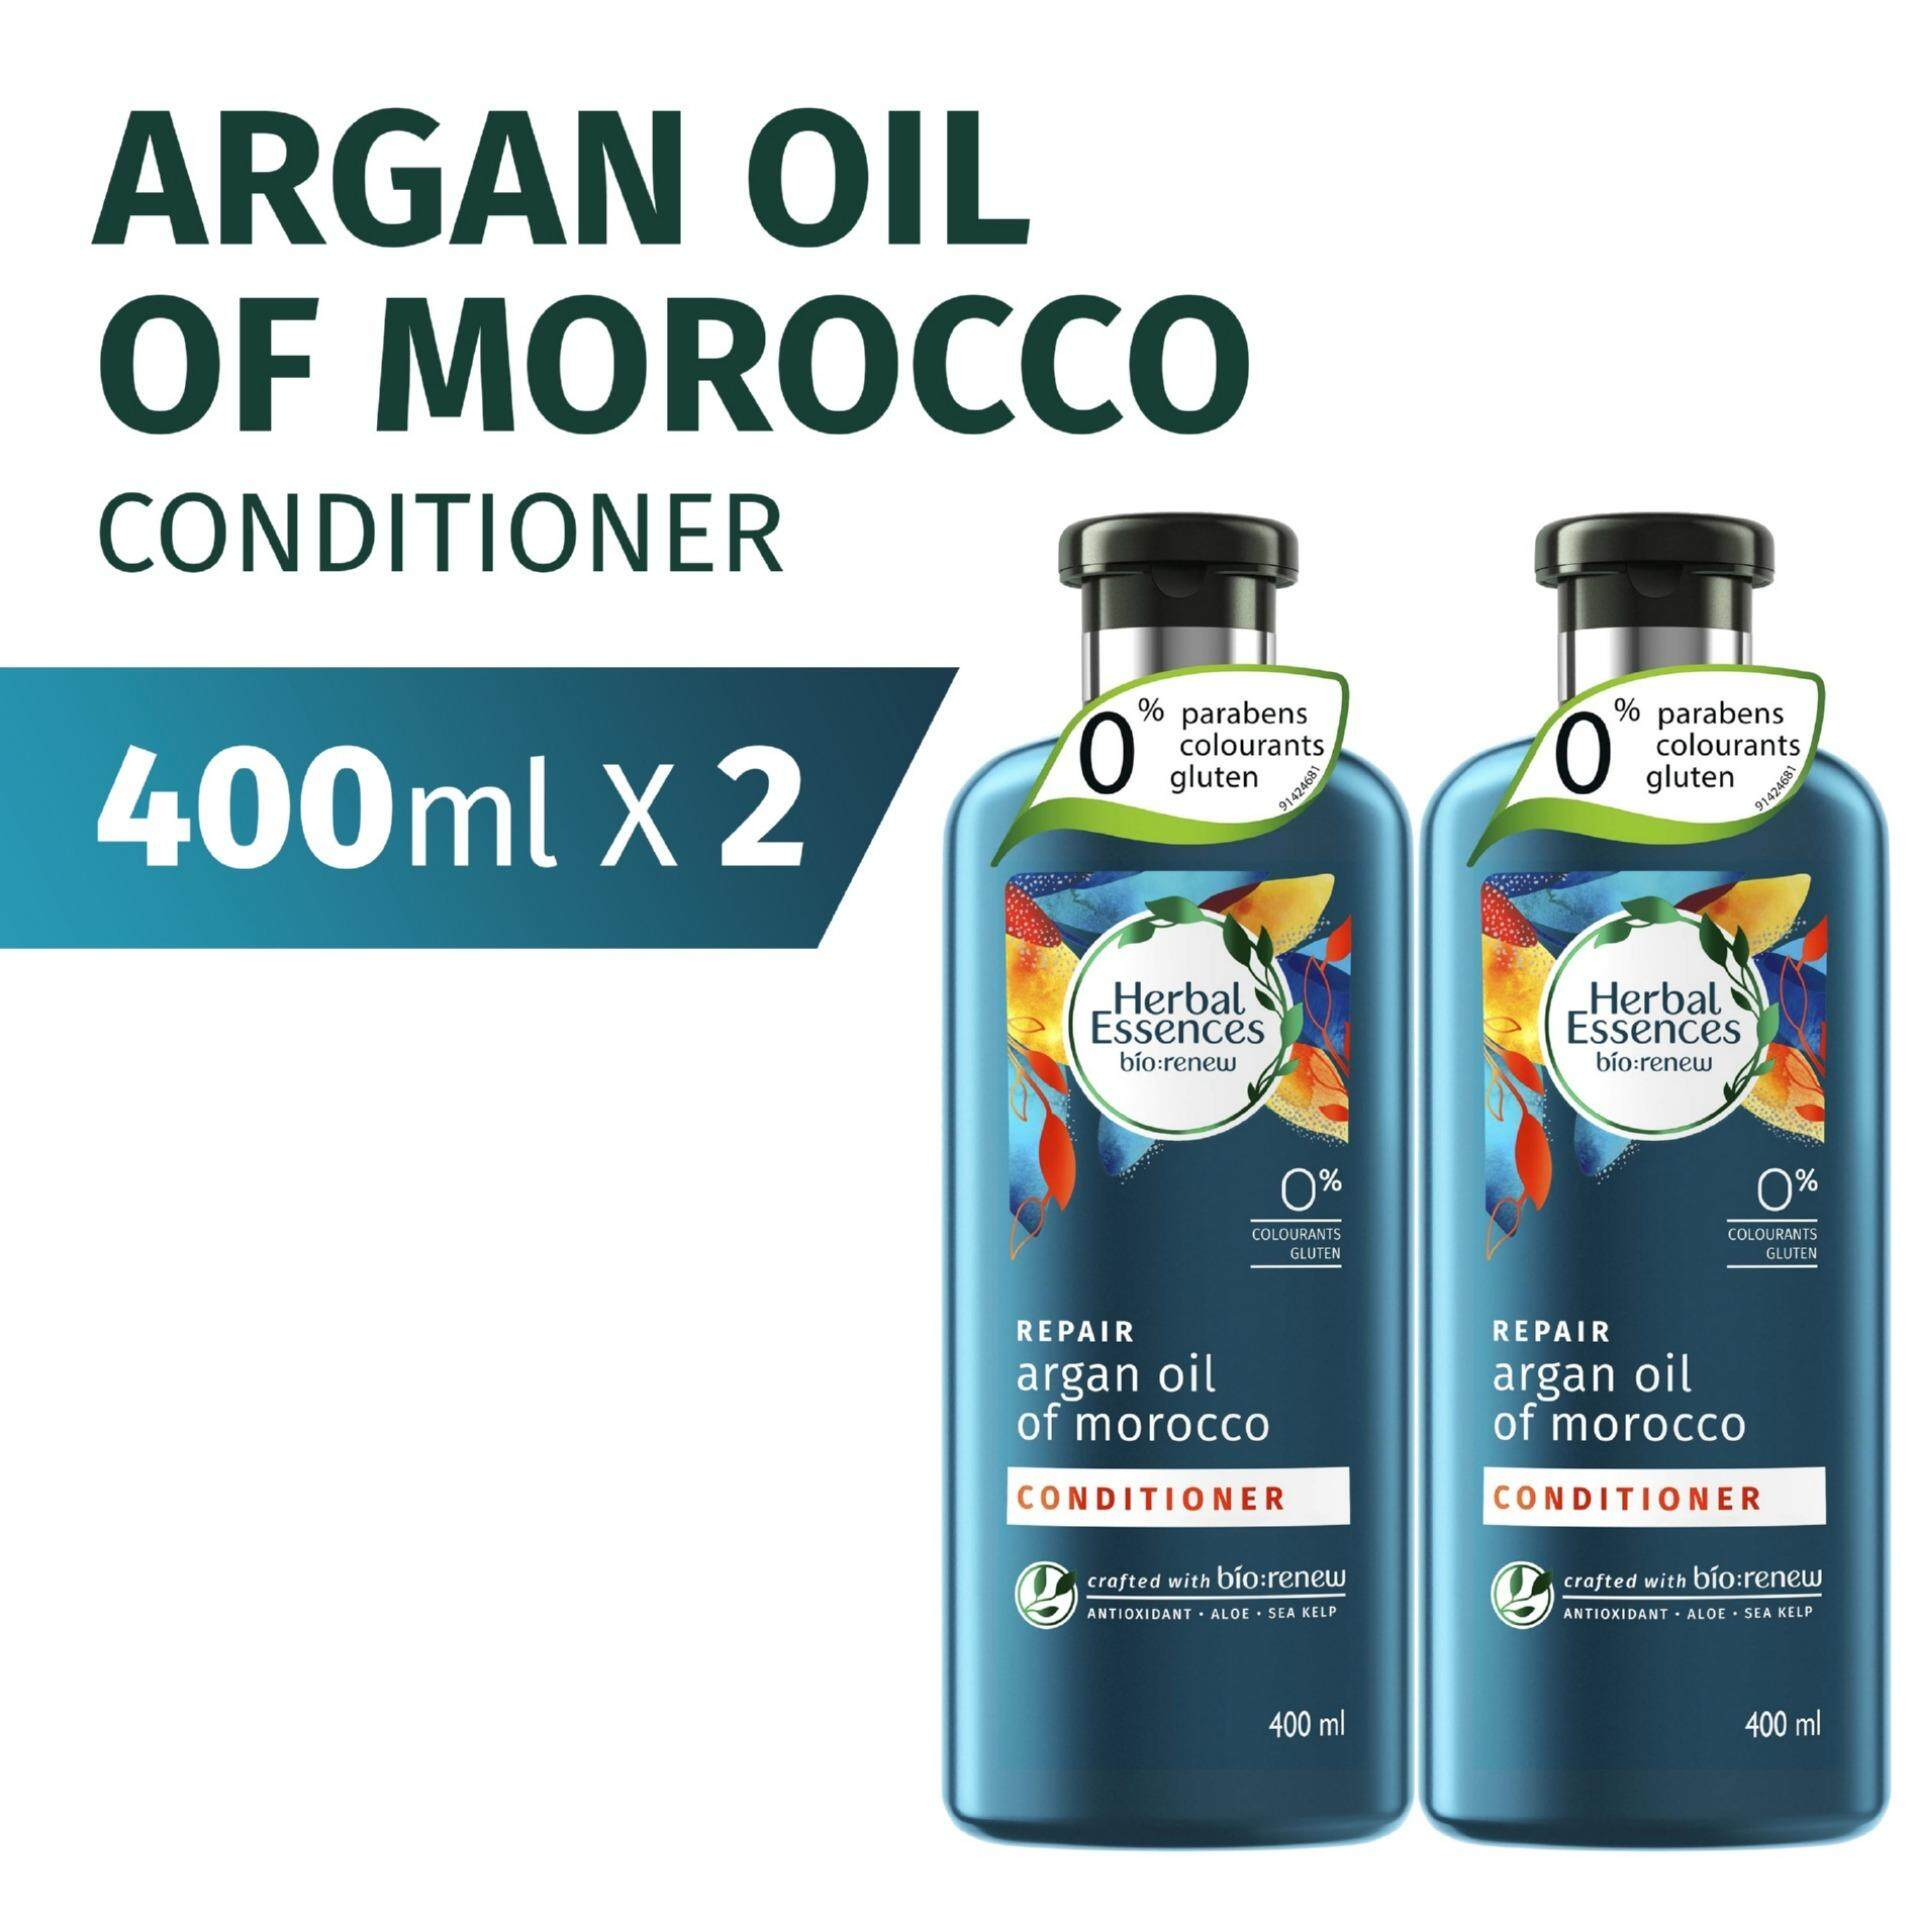 Herbal Essences Bio:Renew REPAIR Argan Oil of Morocco Conditioner 400ml [BUNDLE OF 2]